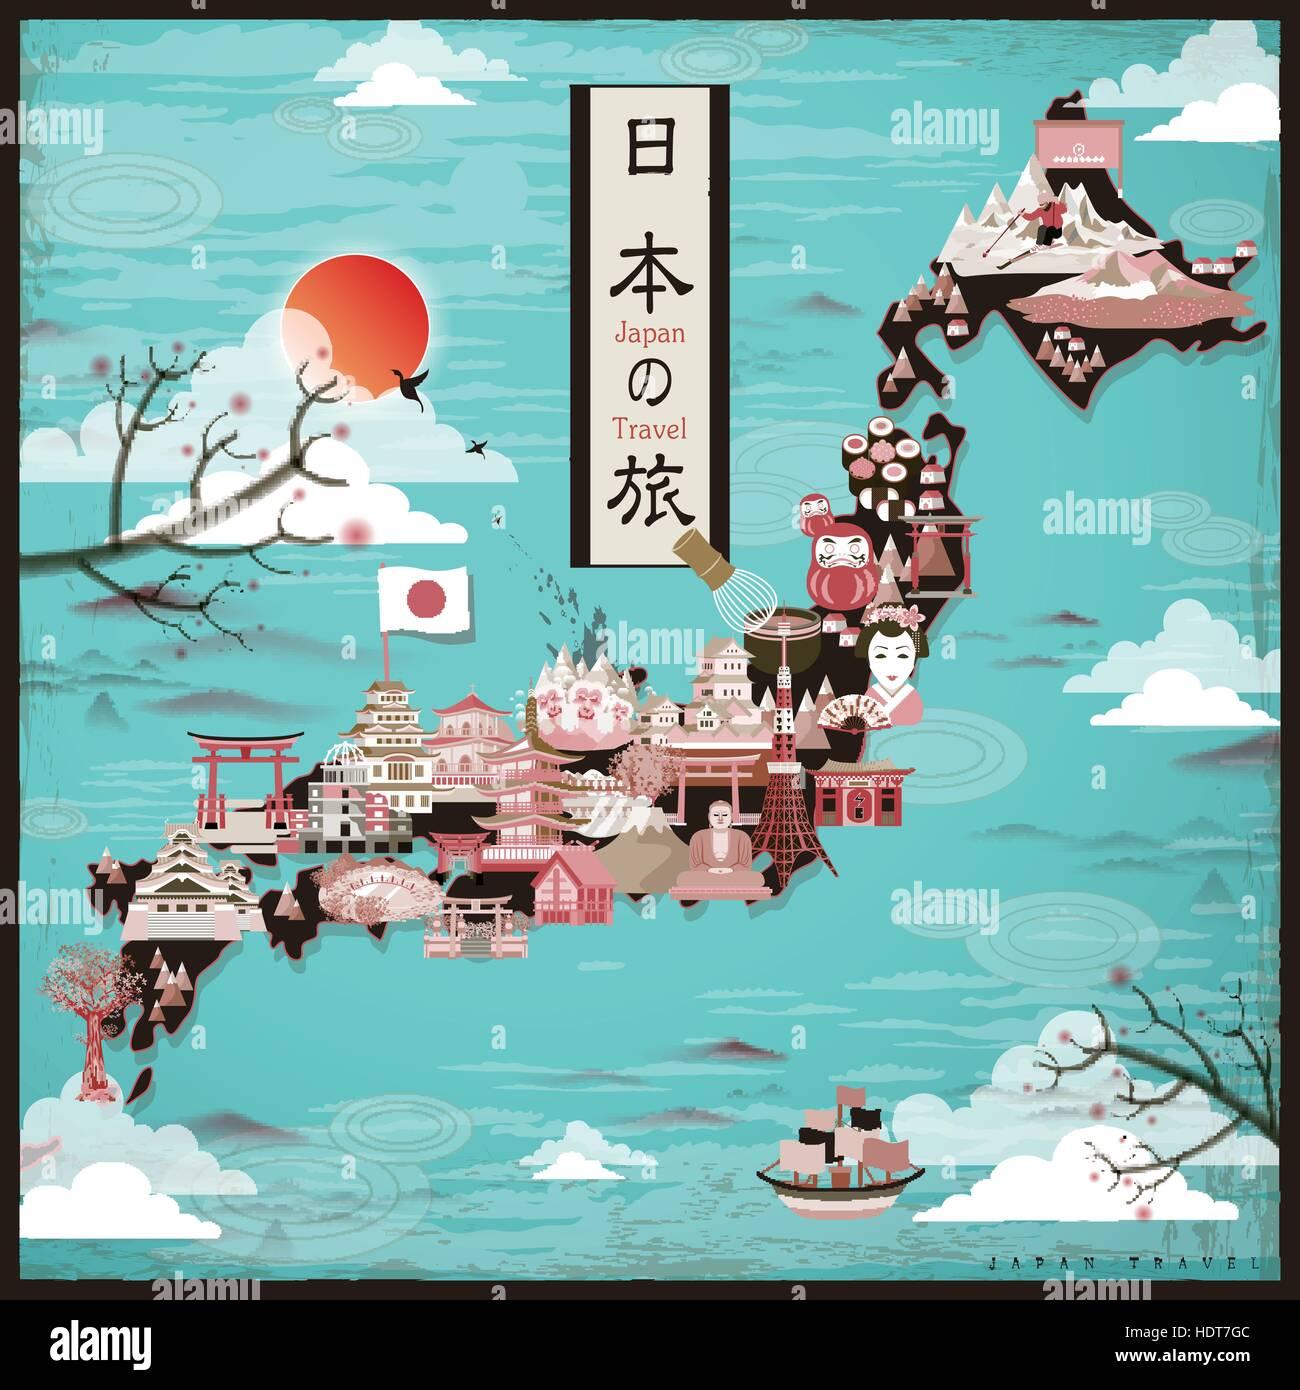 Retro Japan Travel Map Design Japan Travel In Japanese Words - Japan map hd